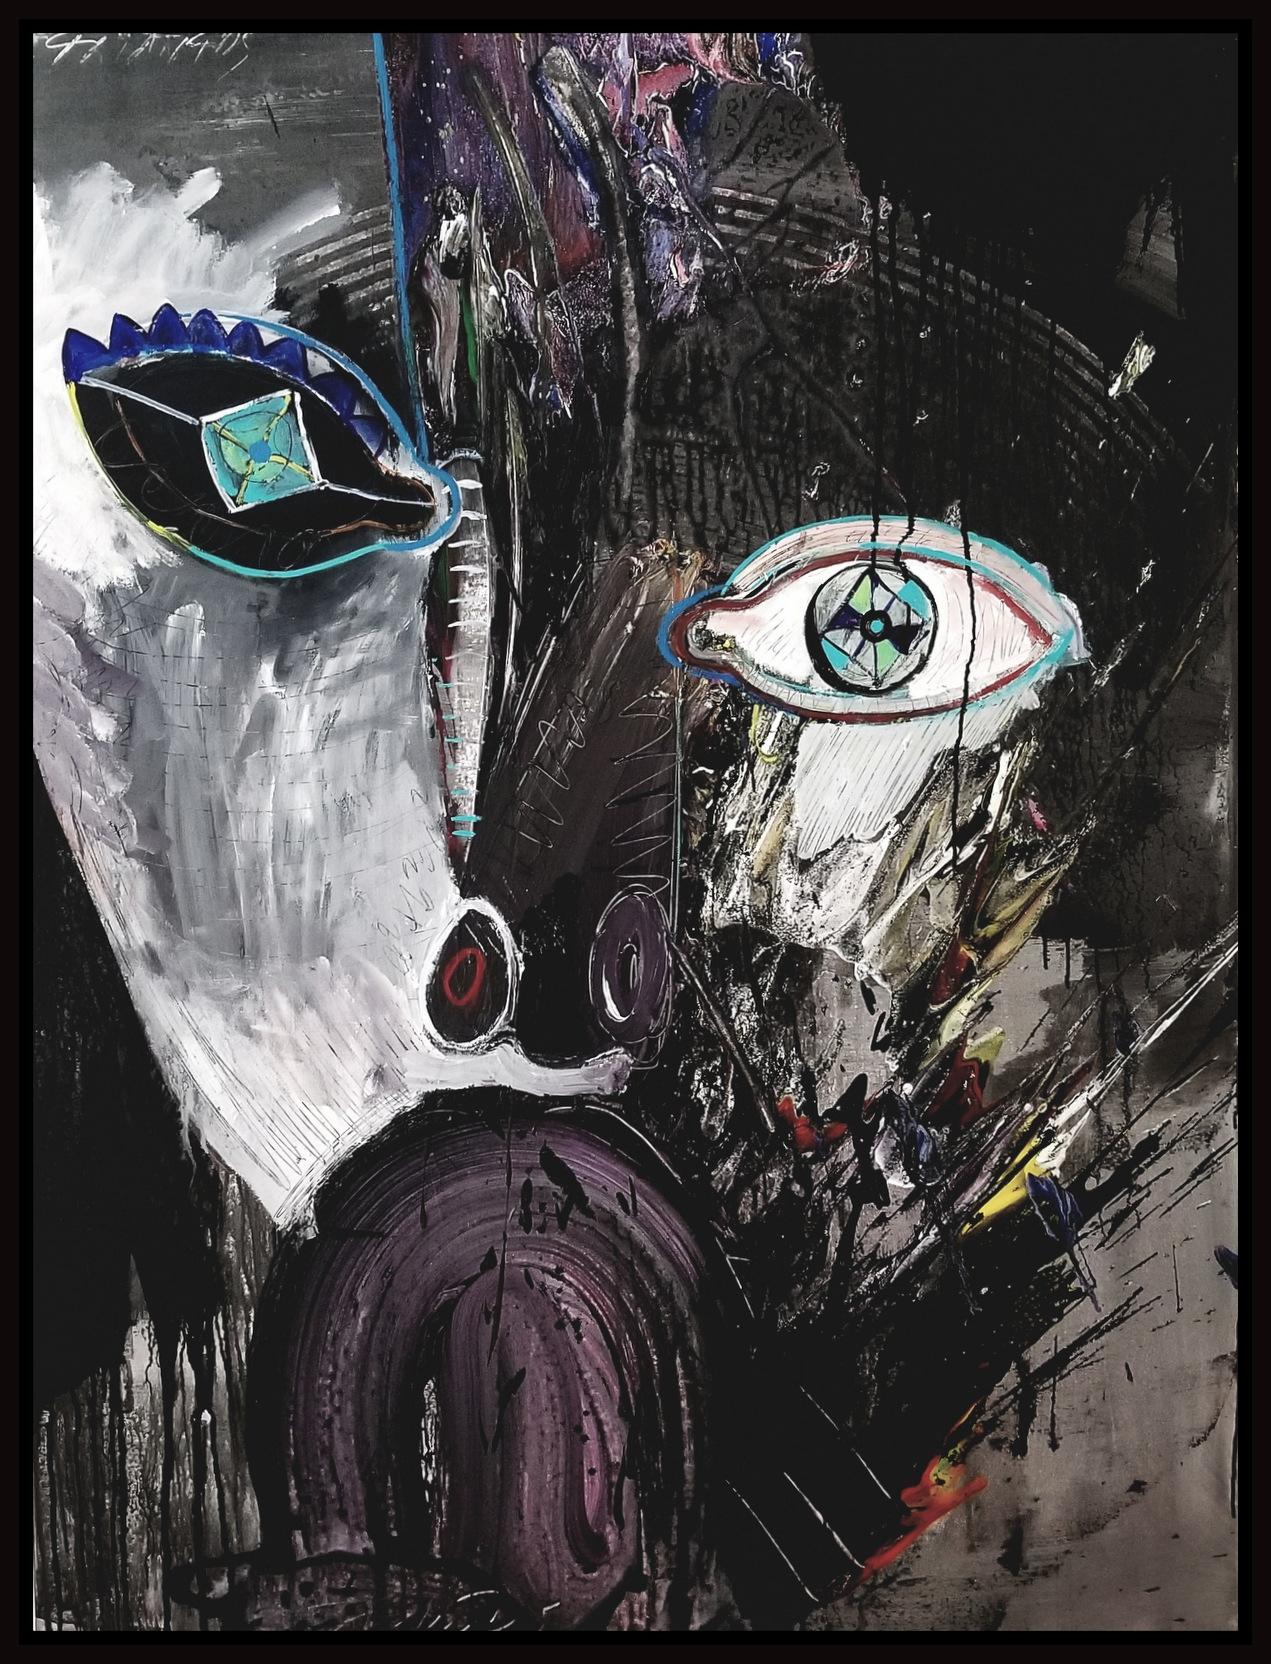 "Black & White #70, 2019, acrylic on canvas, 48"" x 36"" (122 x 91.44 cm)"